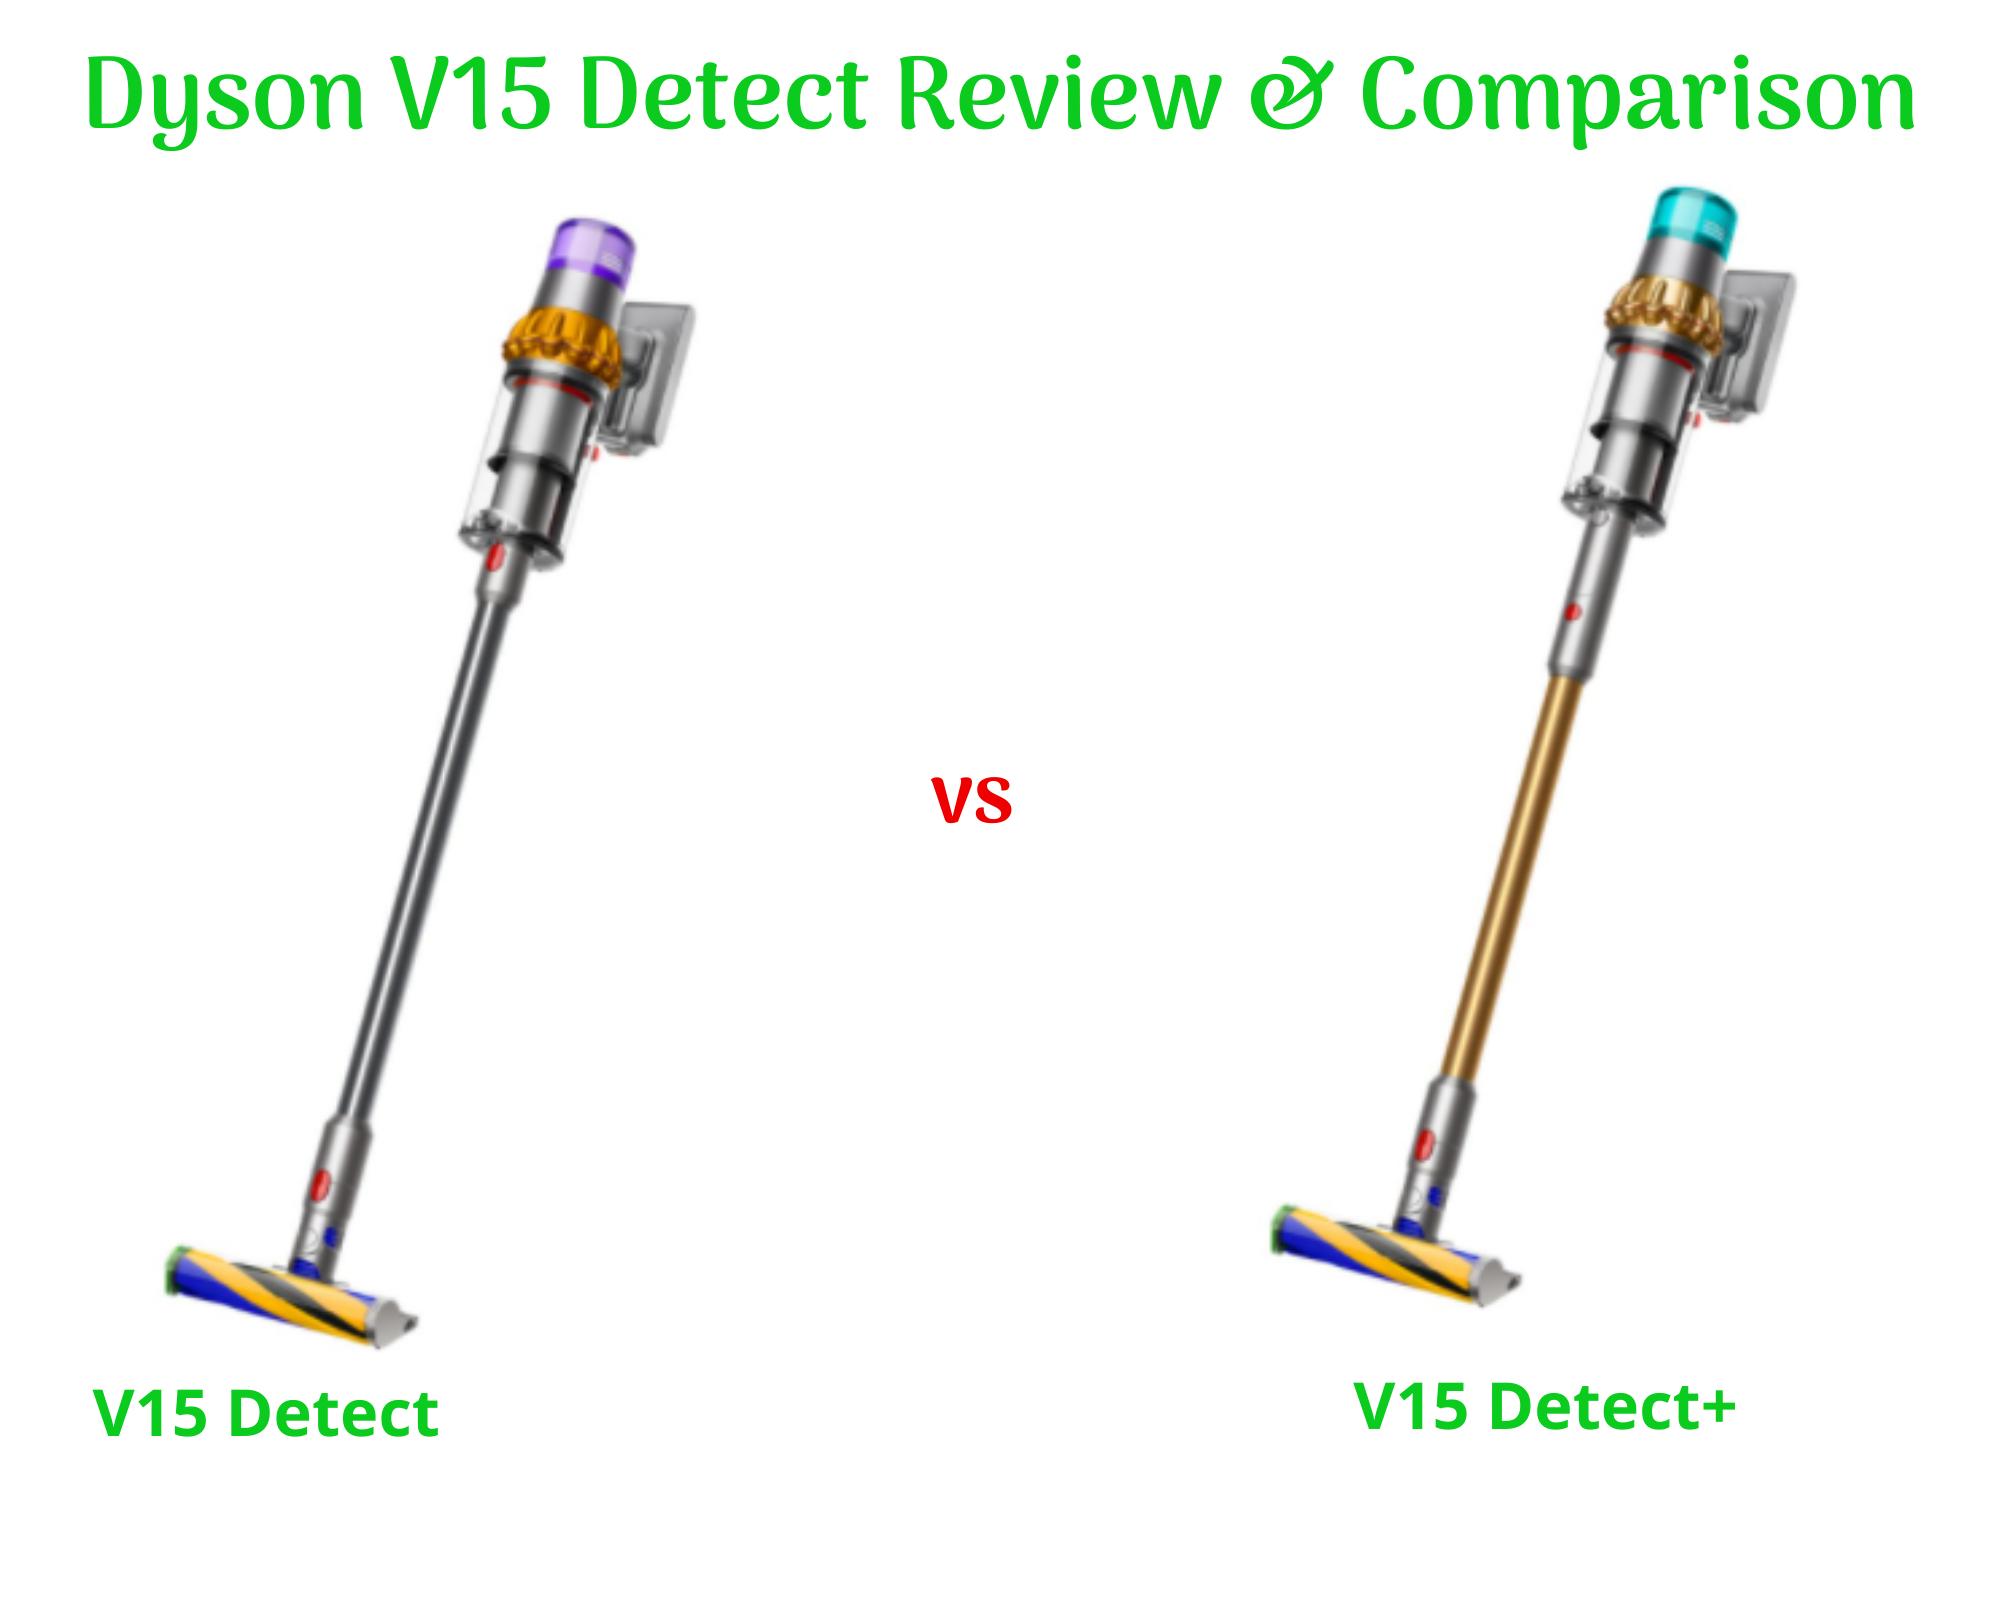 Dyson V15 Detect vs Detect+ Comparison